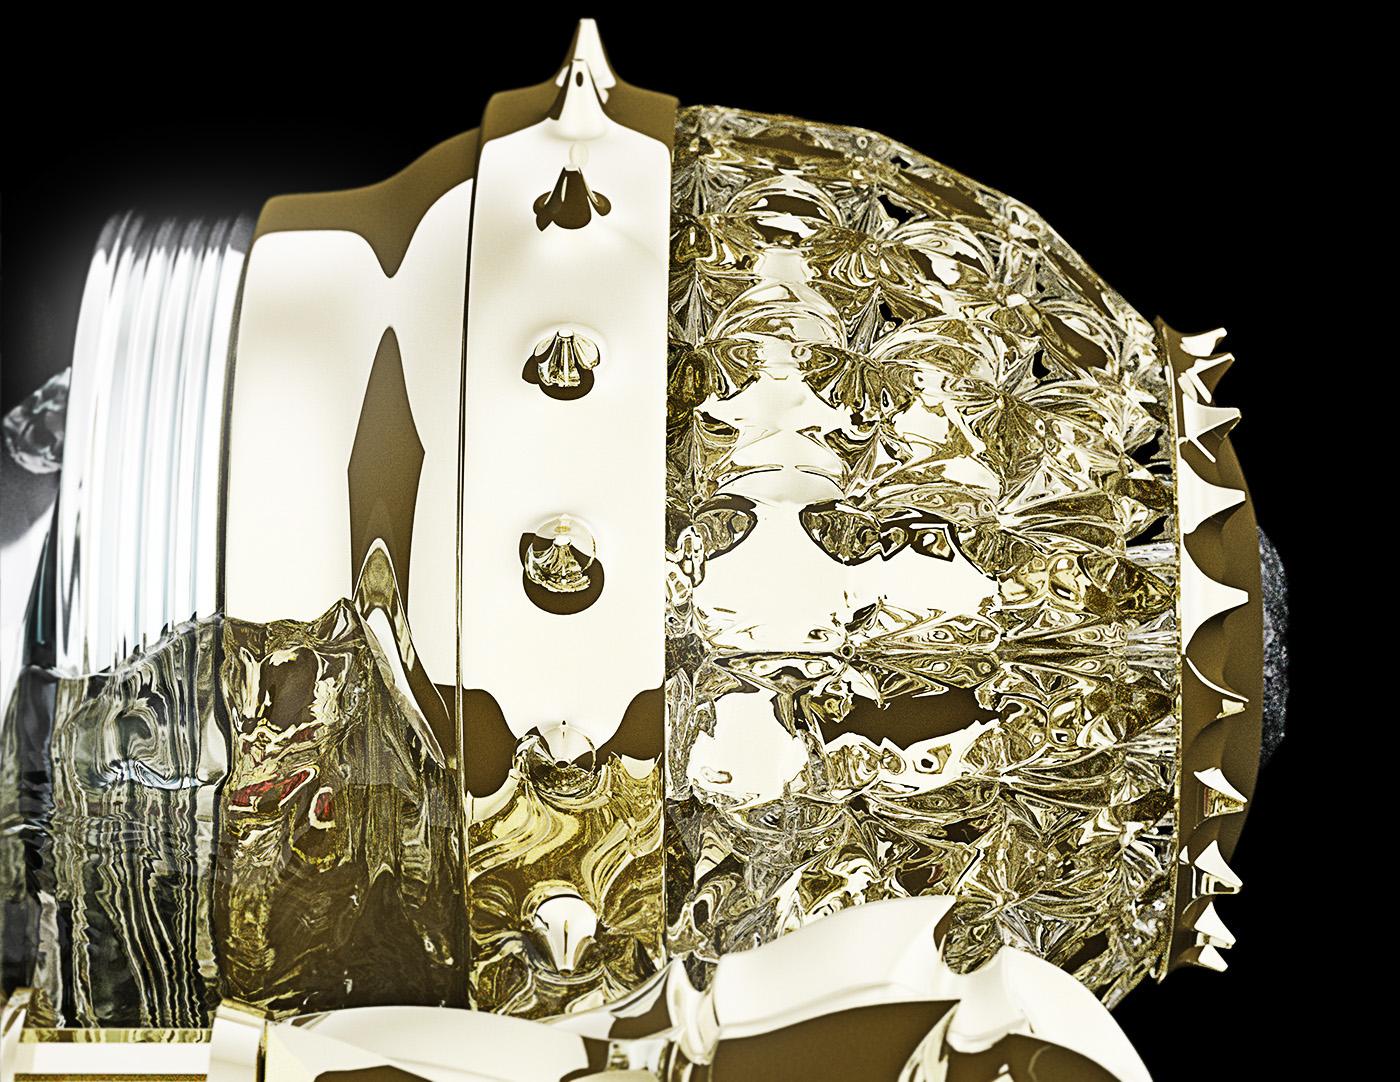 ivan venkov sculpture animal deer composition object digital Zbrush conceptual art gold golden cabinet glass egg Faberge